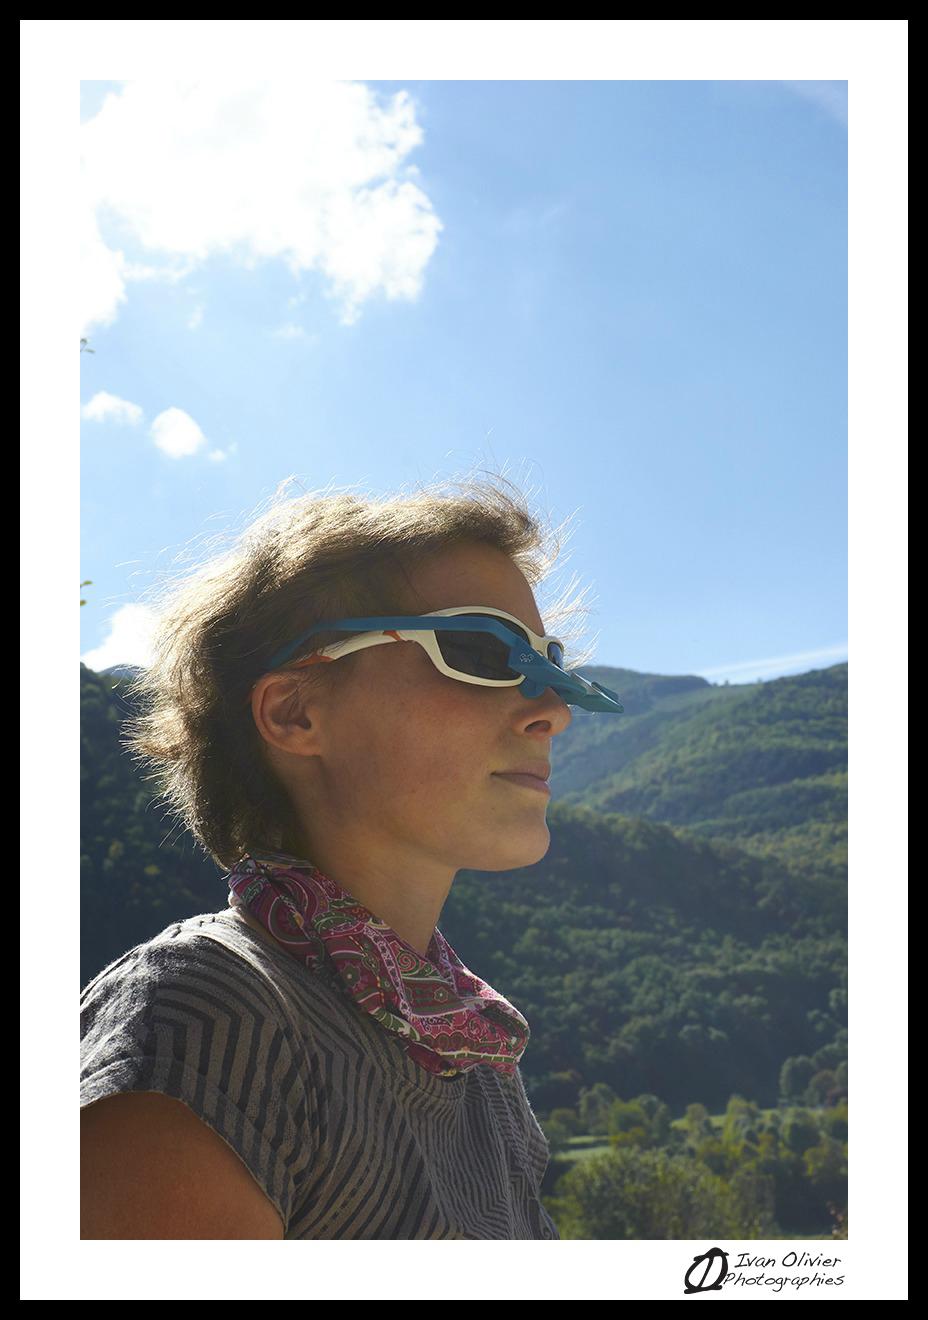 france-lunettes-yy-ivan-olivier-photographie-19